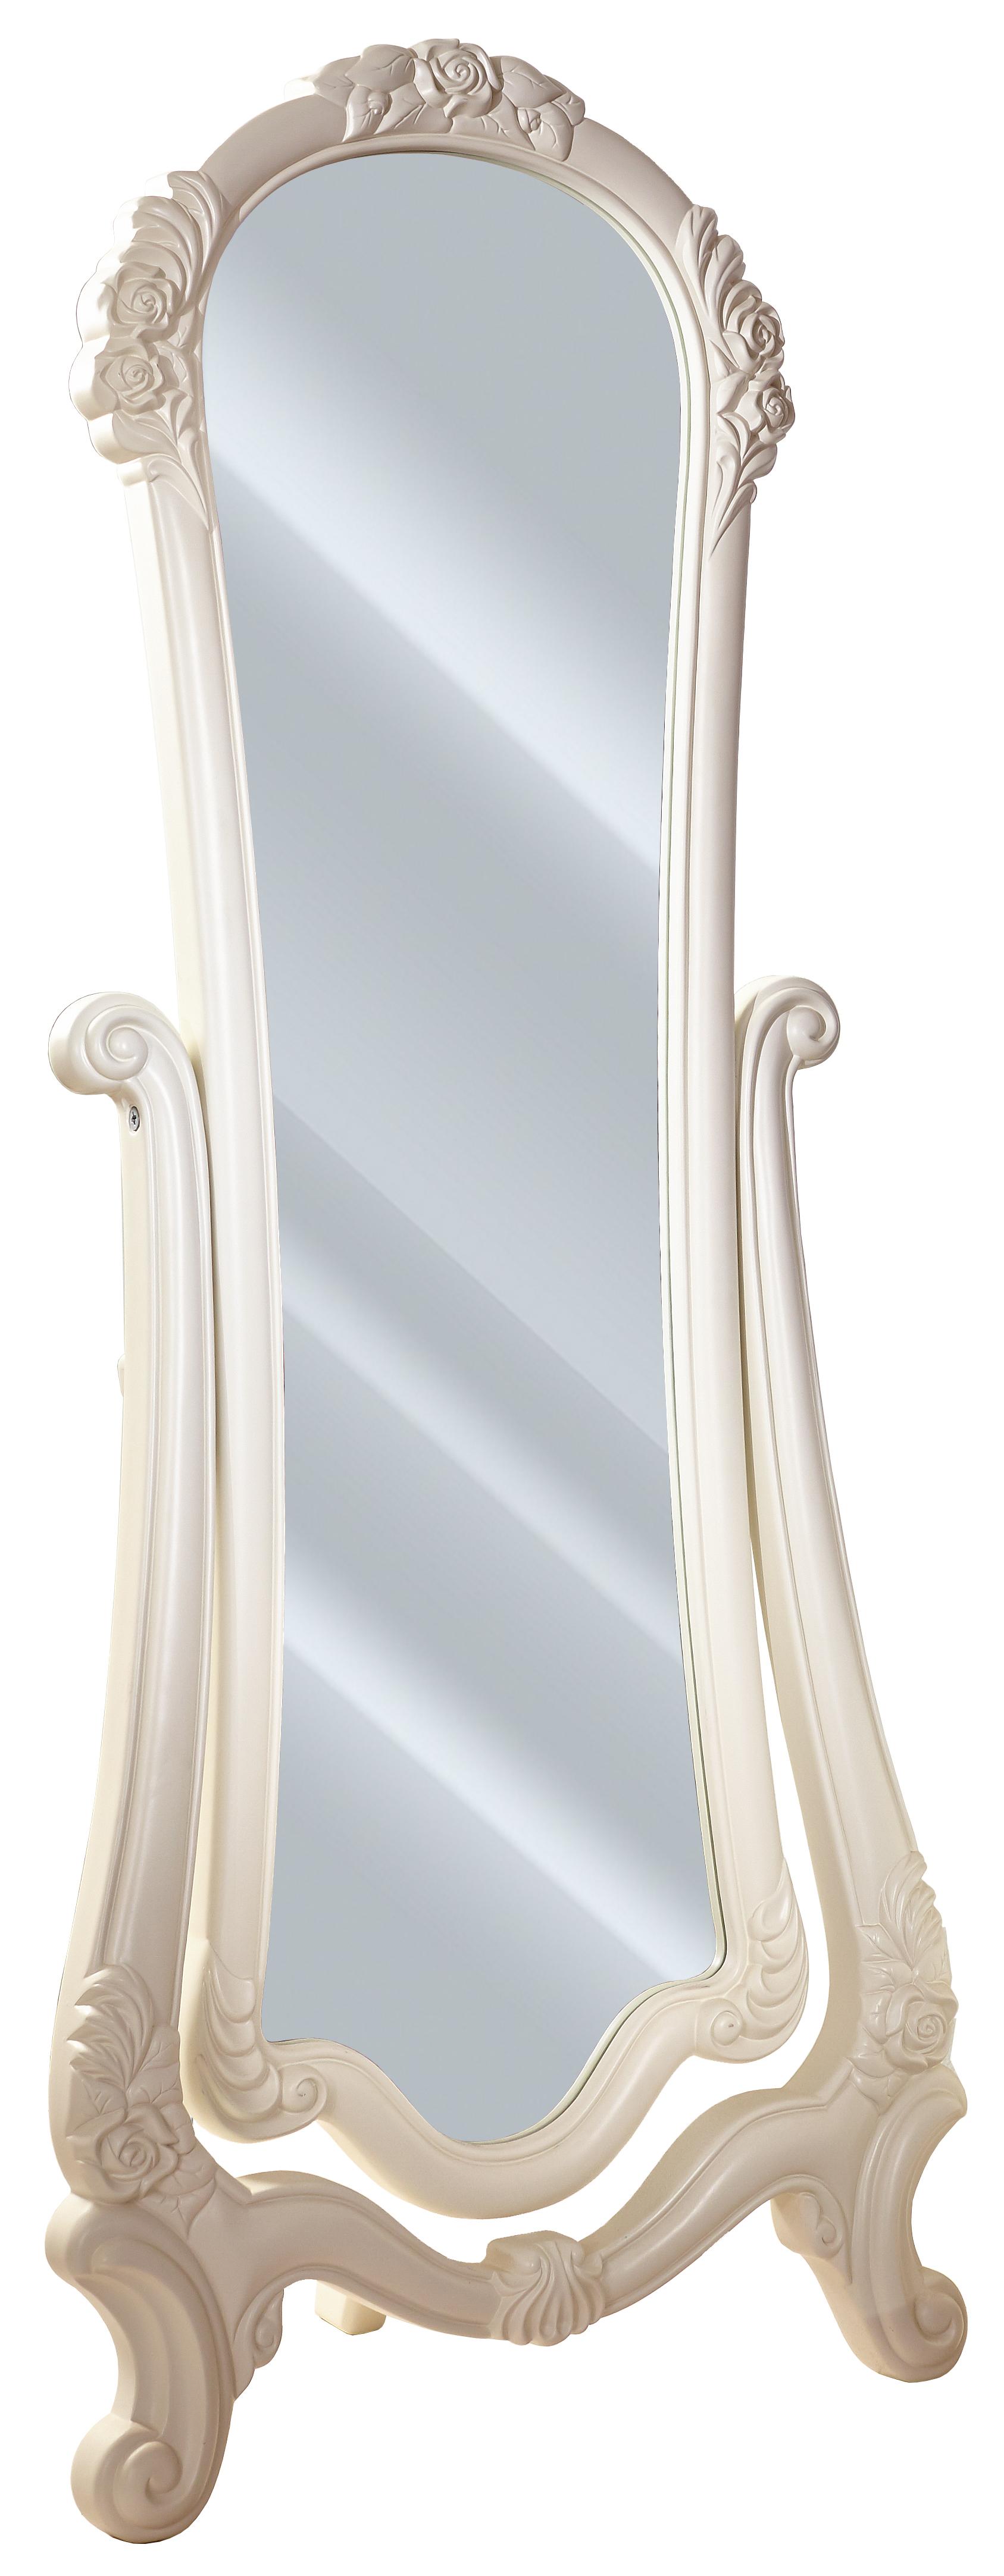 Barock Standspiegel in Weiss Marquisa/Louise